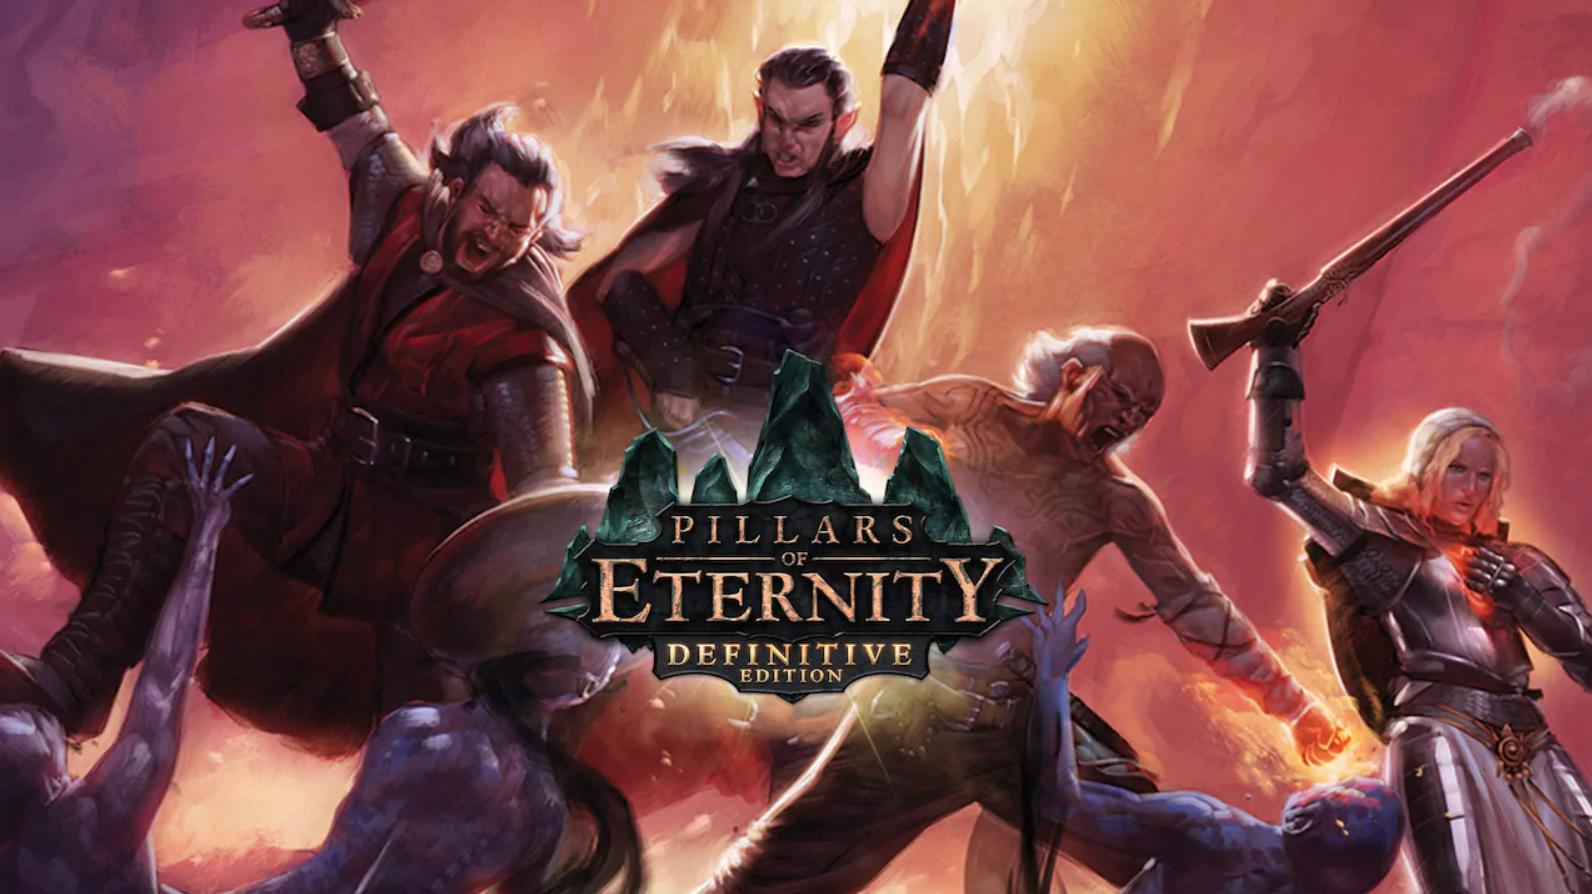 Epic Games раздаст Pillars of Eternity для ПК: классическую RPG от создателей Fallout New Vegas